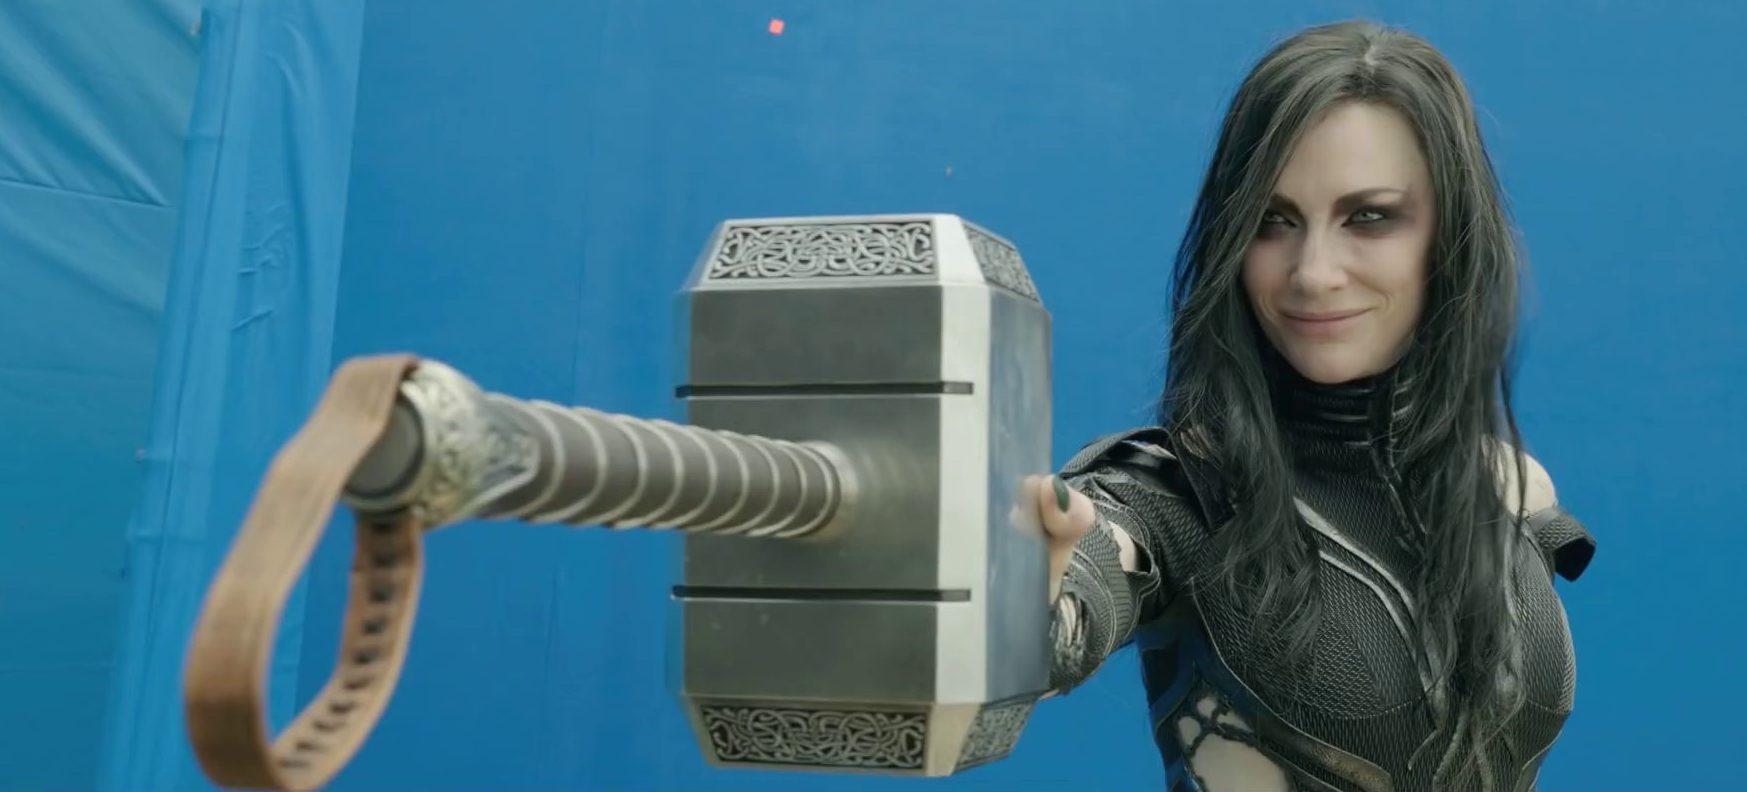 Thor Ragnarok's VFX videos